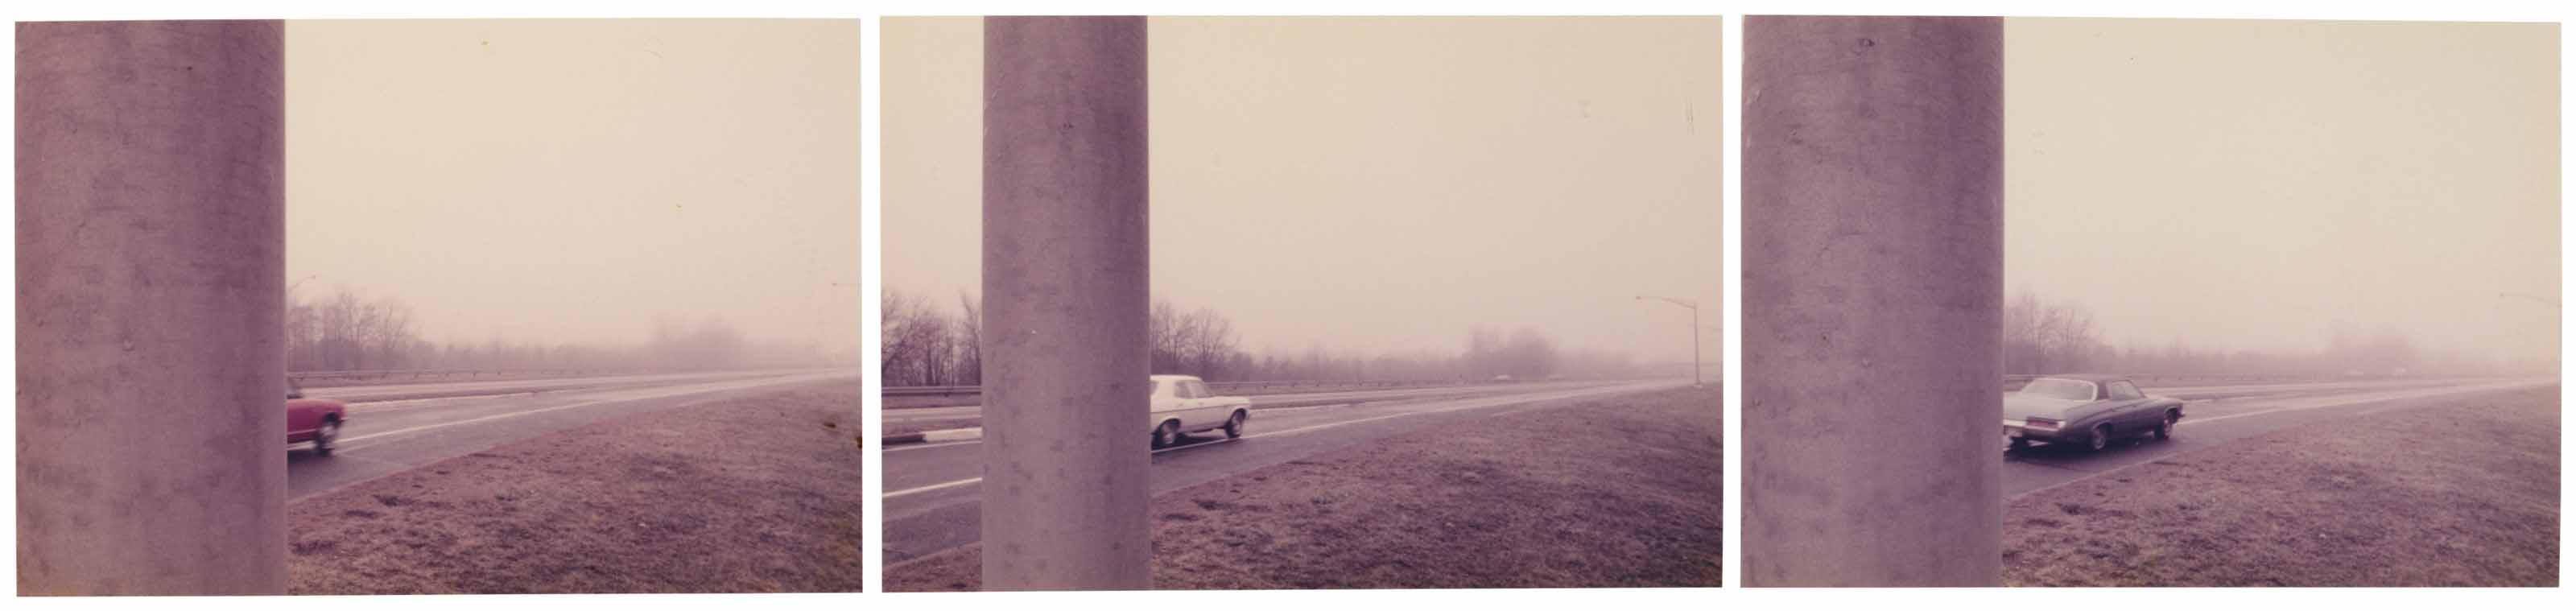 Untitled (New Jersey Turnpike), 1975